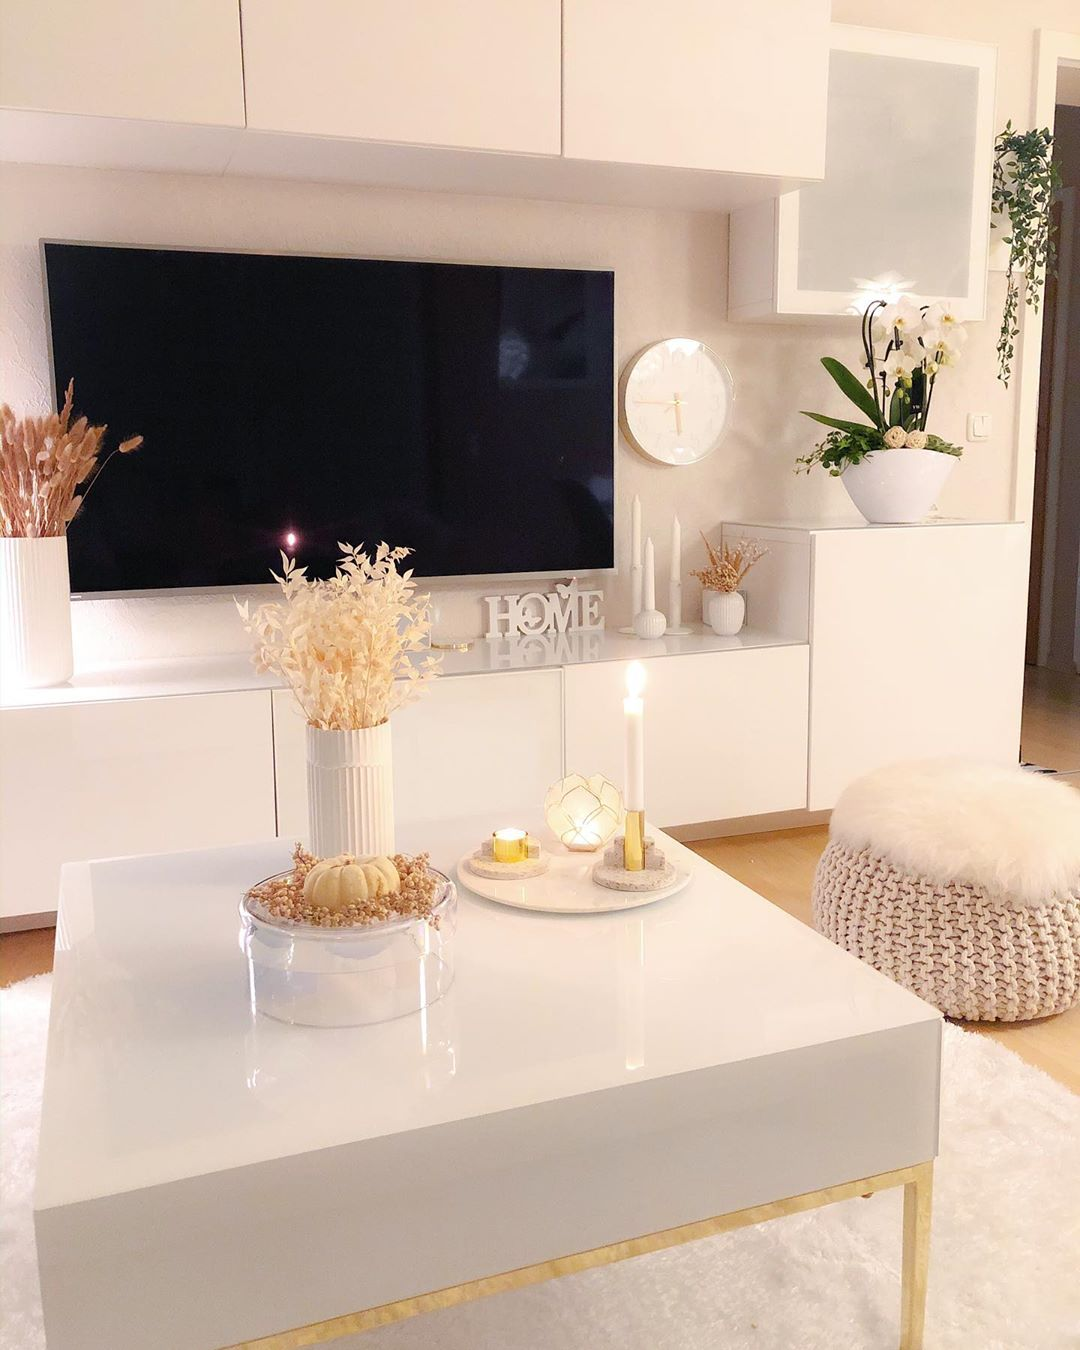 ✨✨ ⓖⓞⓞⓓ ⓔⓥⓔⓝⓘⓝⓖ✨✨ Heute Ein Kurzes Hallo Livingroom - Decoration Ideas